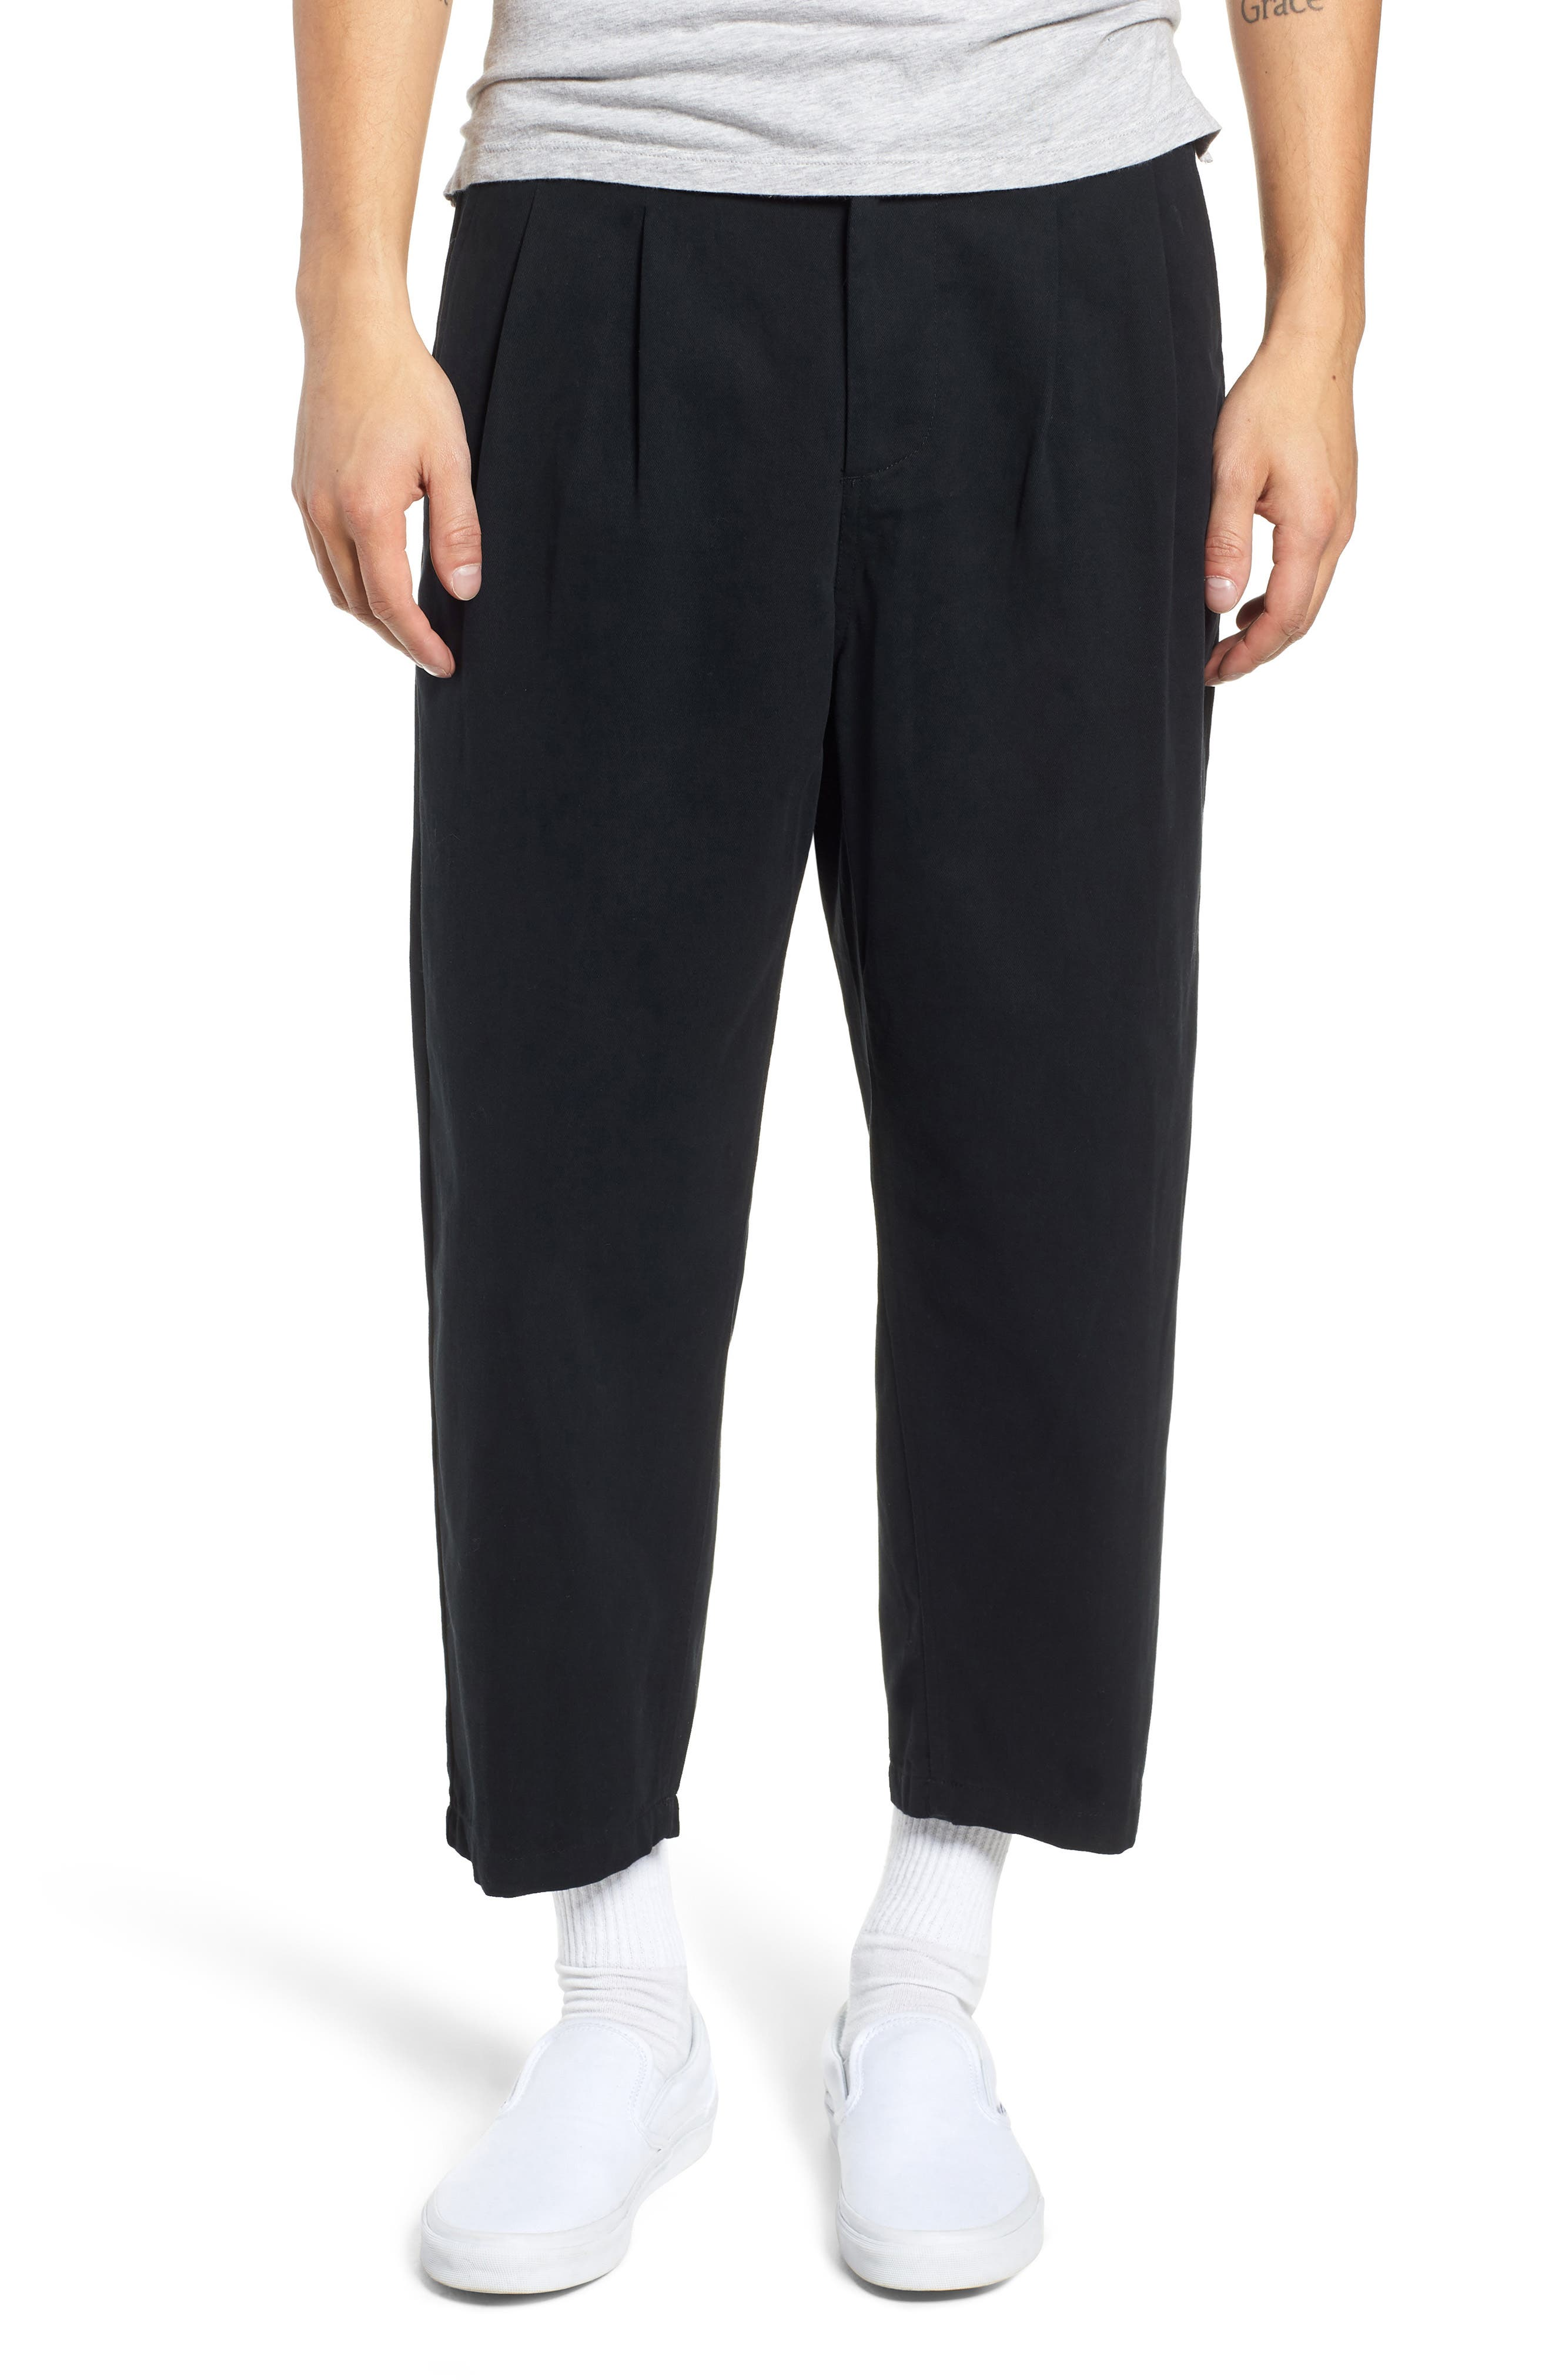 Fubar Pleated Relaxed Fit Pants,                             Main thumbnail 1, color,                             BLACK